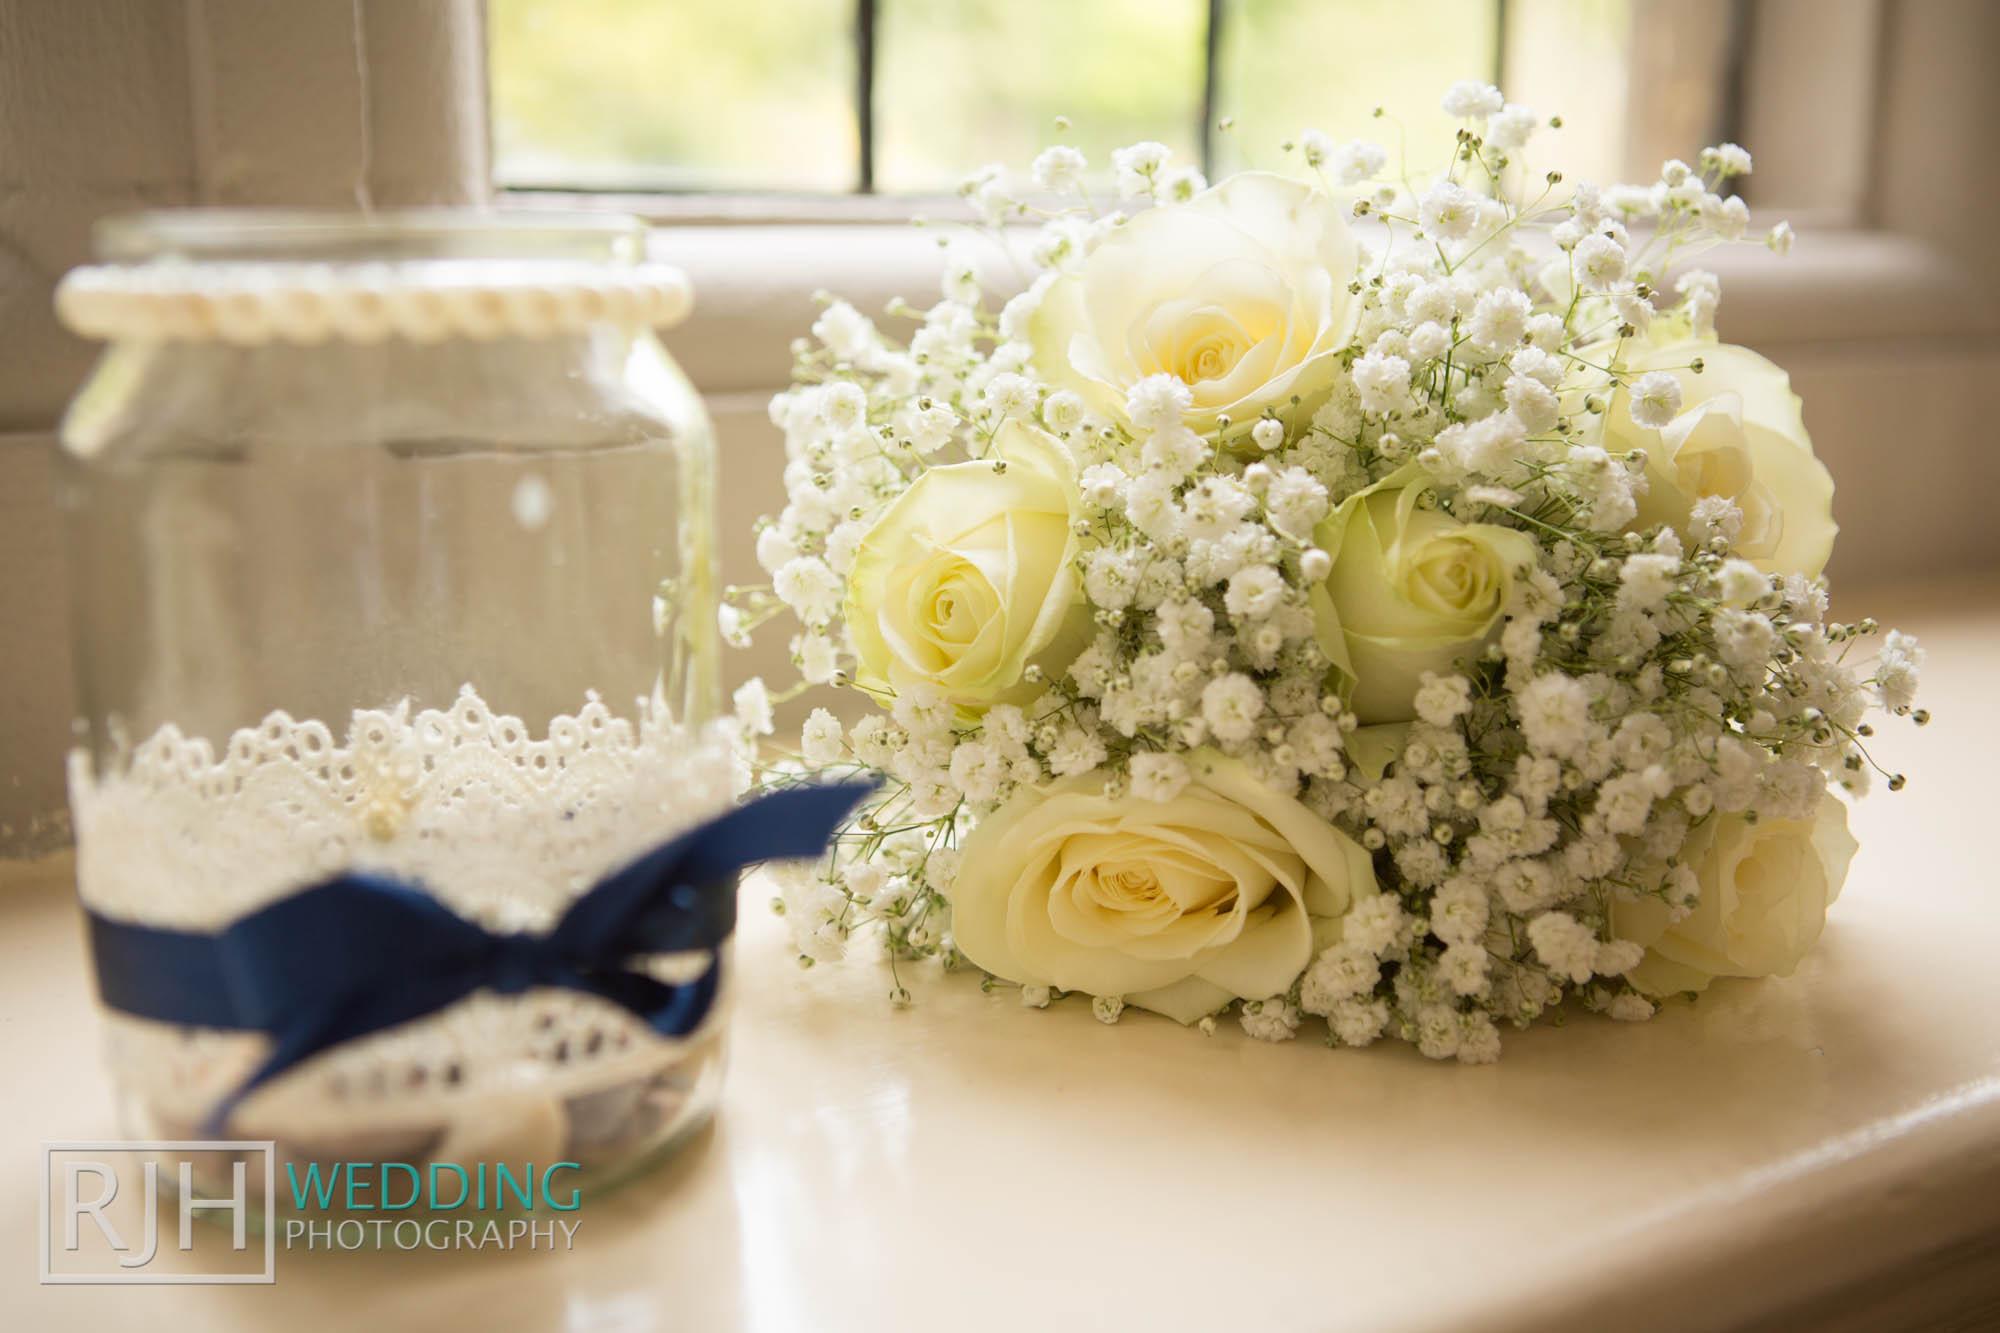 Whitley Hall Marples Wedding_2_3C2A8359.jpg